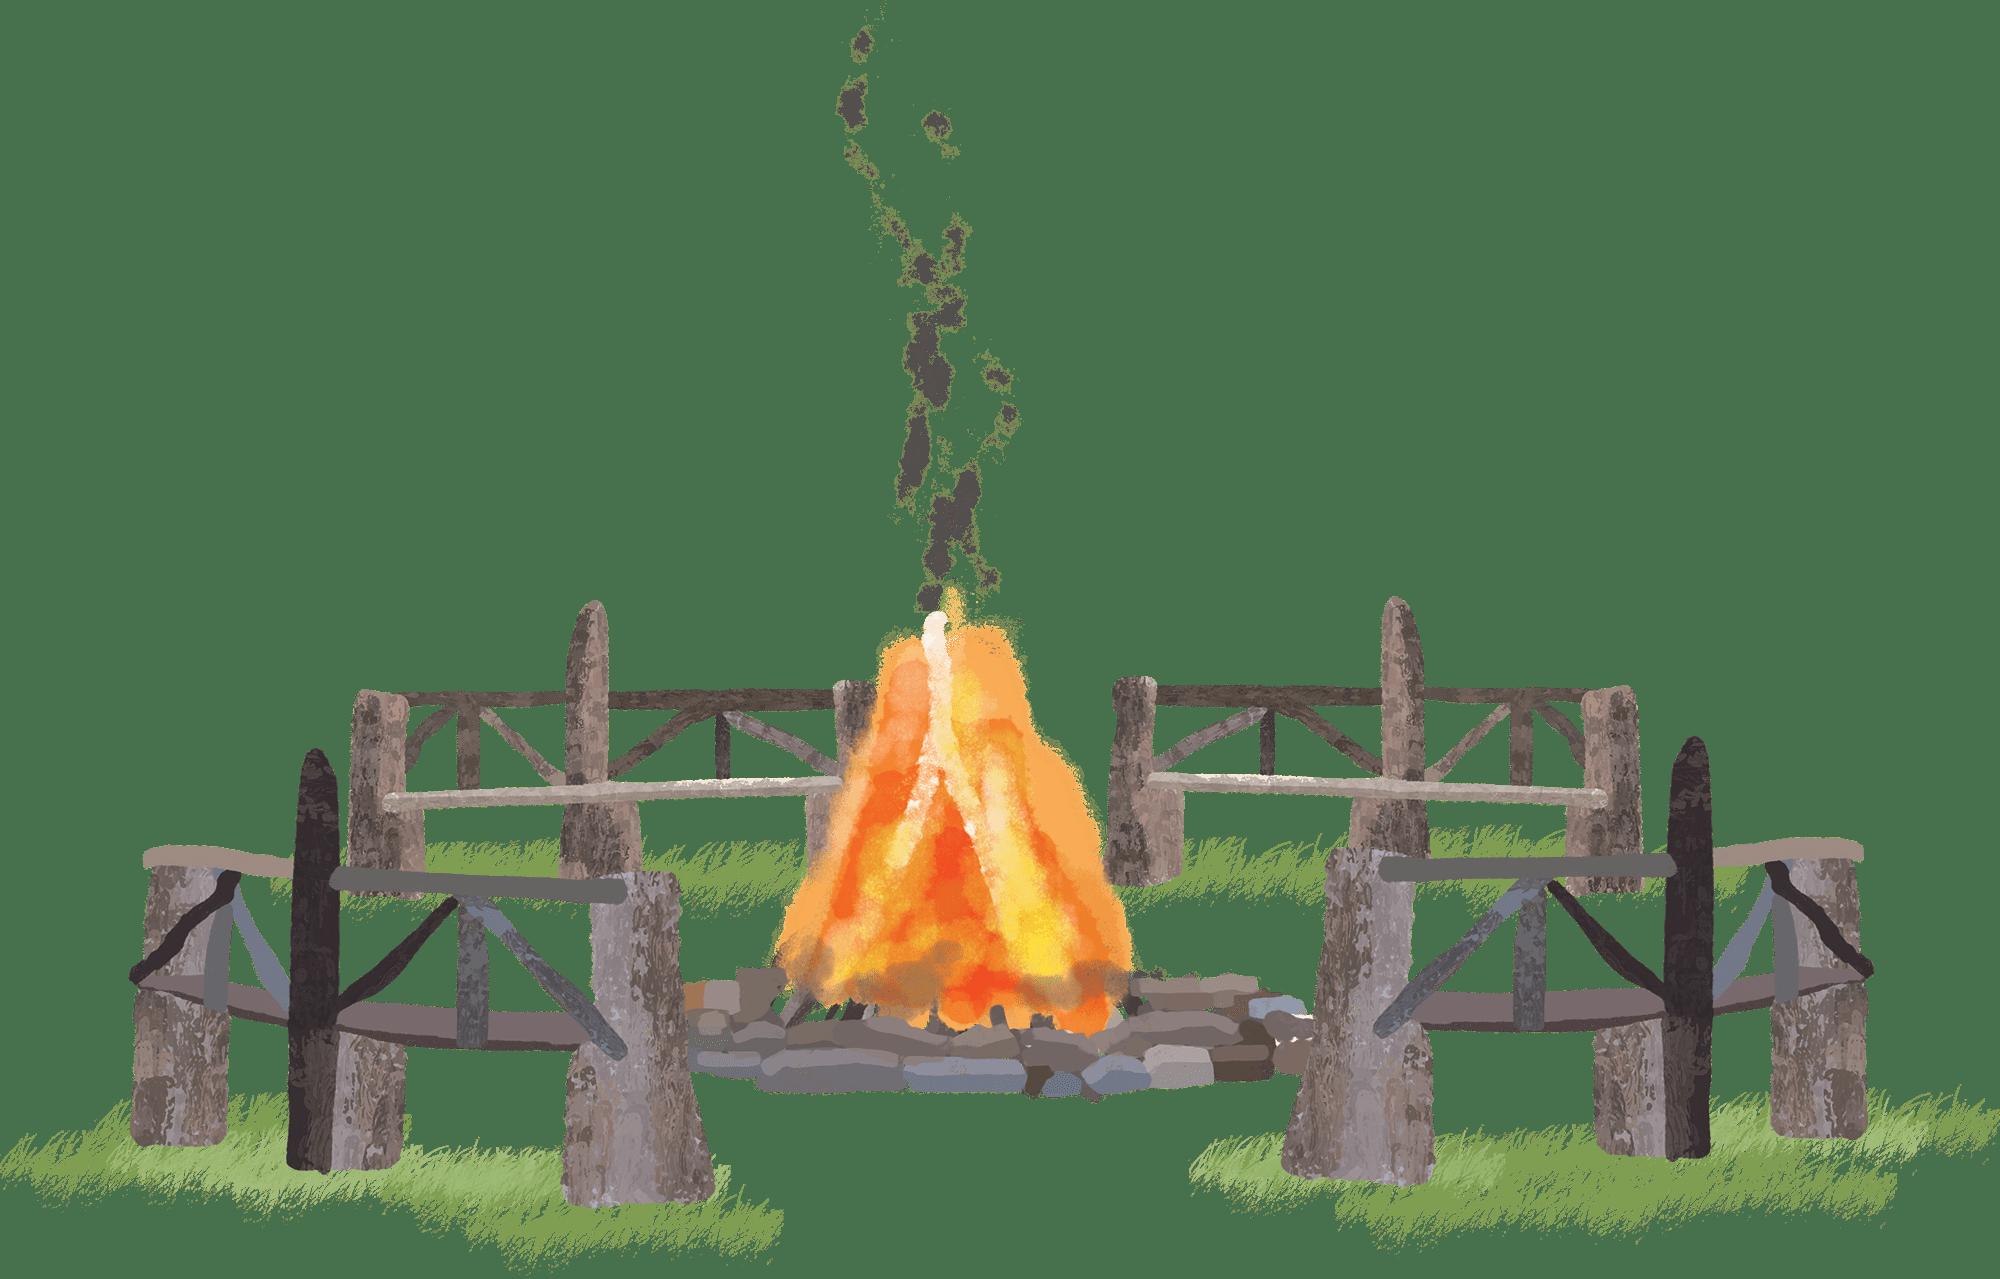 Illustration of fire pit